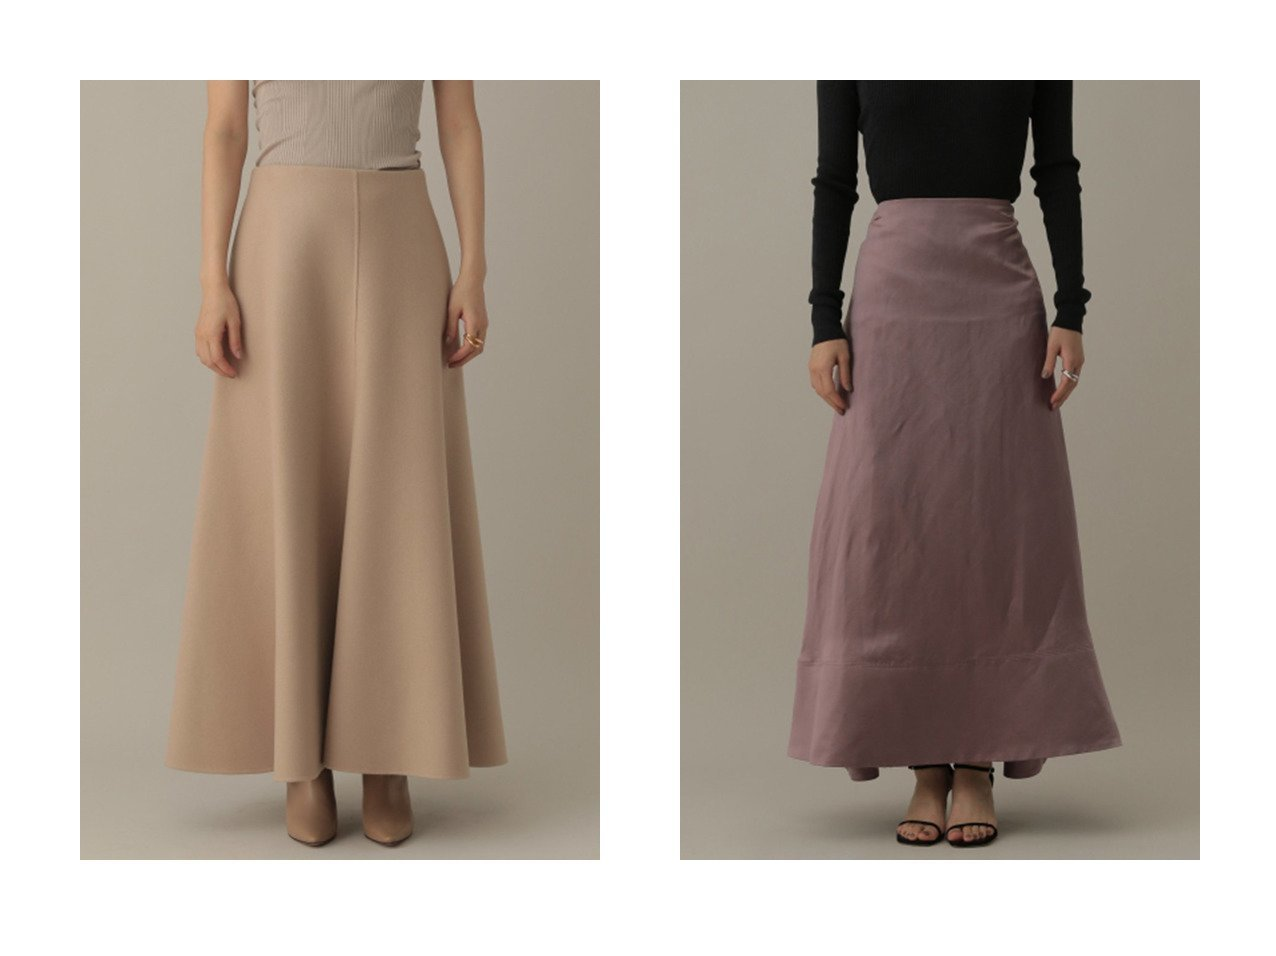 【Chaos/カオス】のスーペリアロッタスカート&マンサリーロスロングスカート 【スカート】おすすめ!人気、トレンド・レディースファッションの通販 おすすめで人気の流行・トレンド、ファッションの通販商品 インテリア・家具・メンズファッション・キッズファッション・レディースファッション・服の通販 founy(ファニー) https://founy.com/ ファッション Fashion レディースファッション WOMEN スカート Skirt ロングスカート Long Skirt 2021年 2021 2021-2022秋冬・A/W AW・Autumn/Winter・FW・Fall-Winter・2021-2022 A/W・秋冬 AW・Autumn/Winter・FW・Fall-Winter エレガント サテン シルク シンプル リネン ロング おすすめ Recommend メルトン 人気 |ID:crp329100000054044